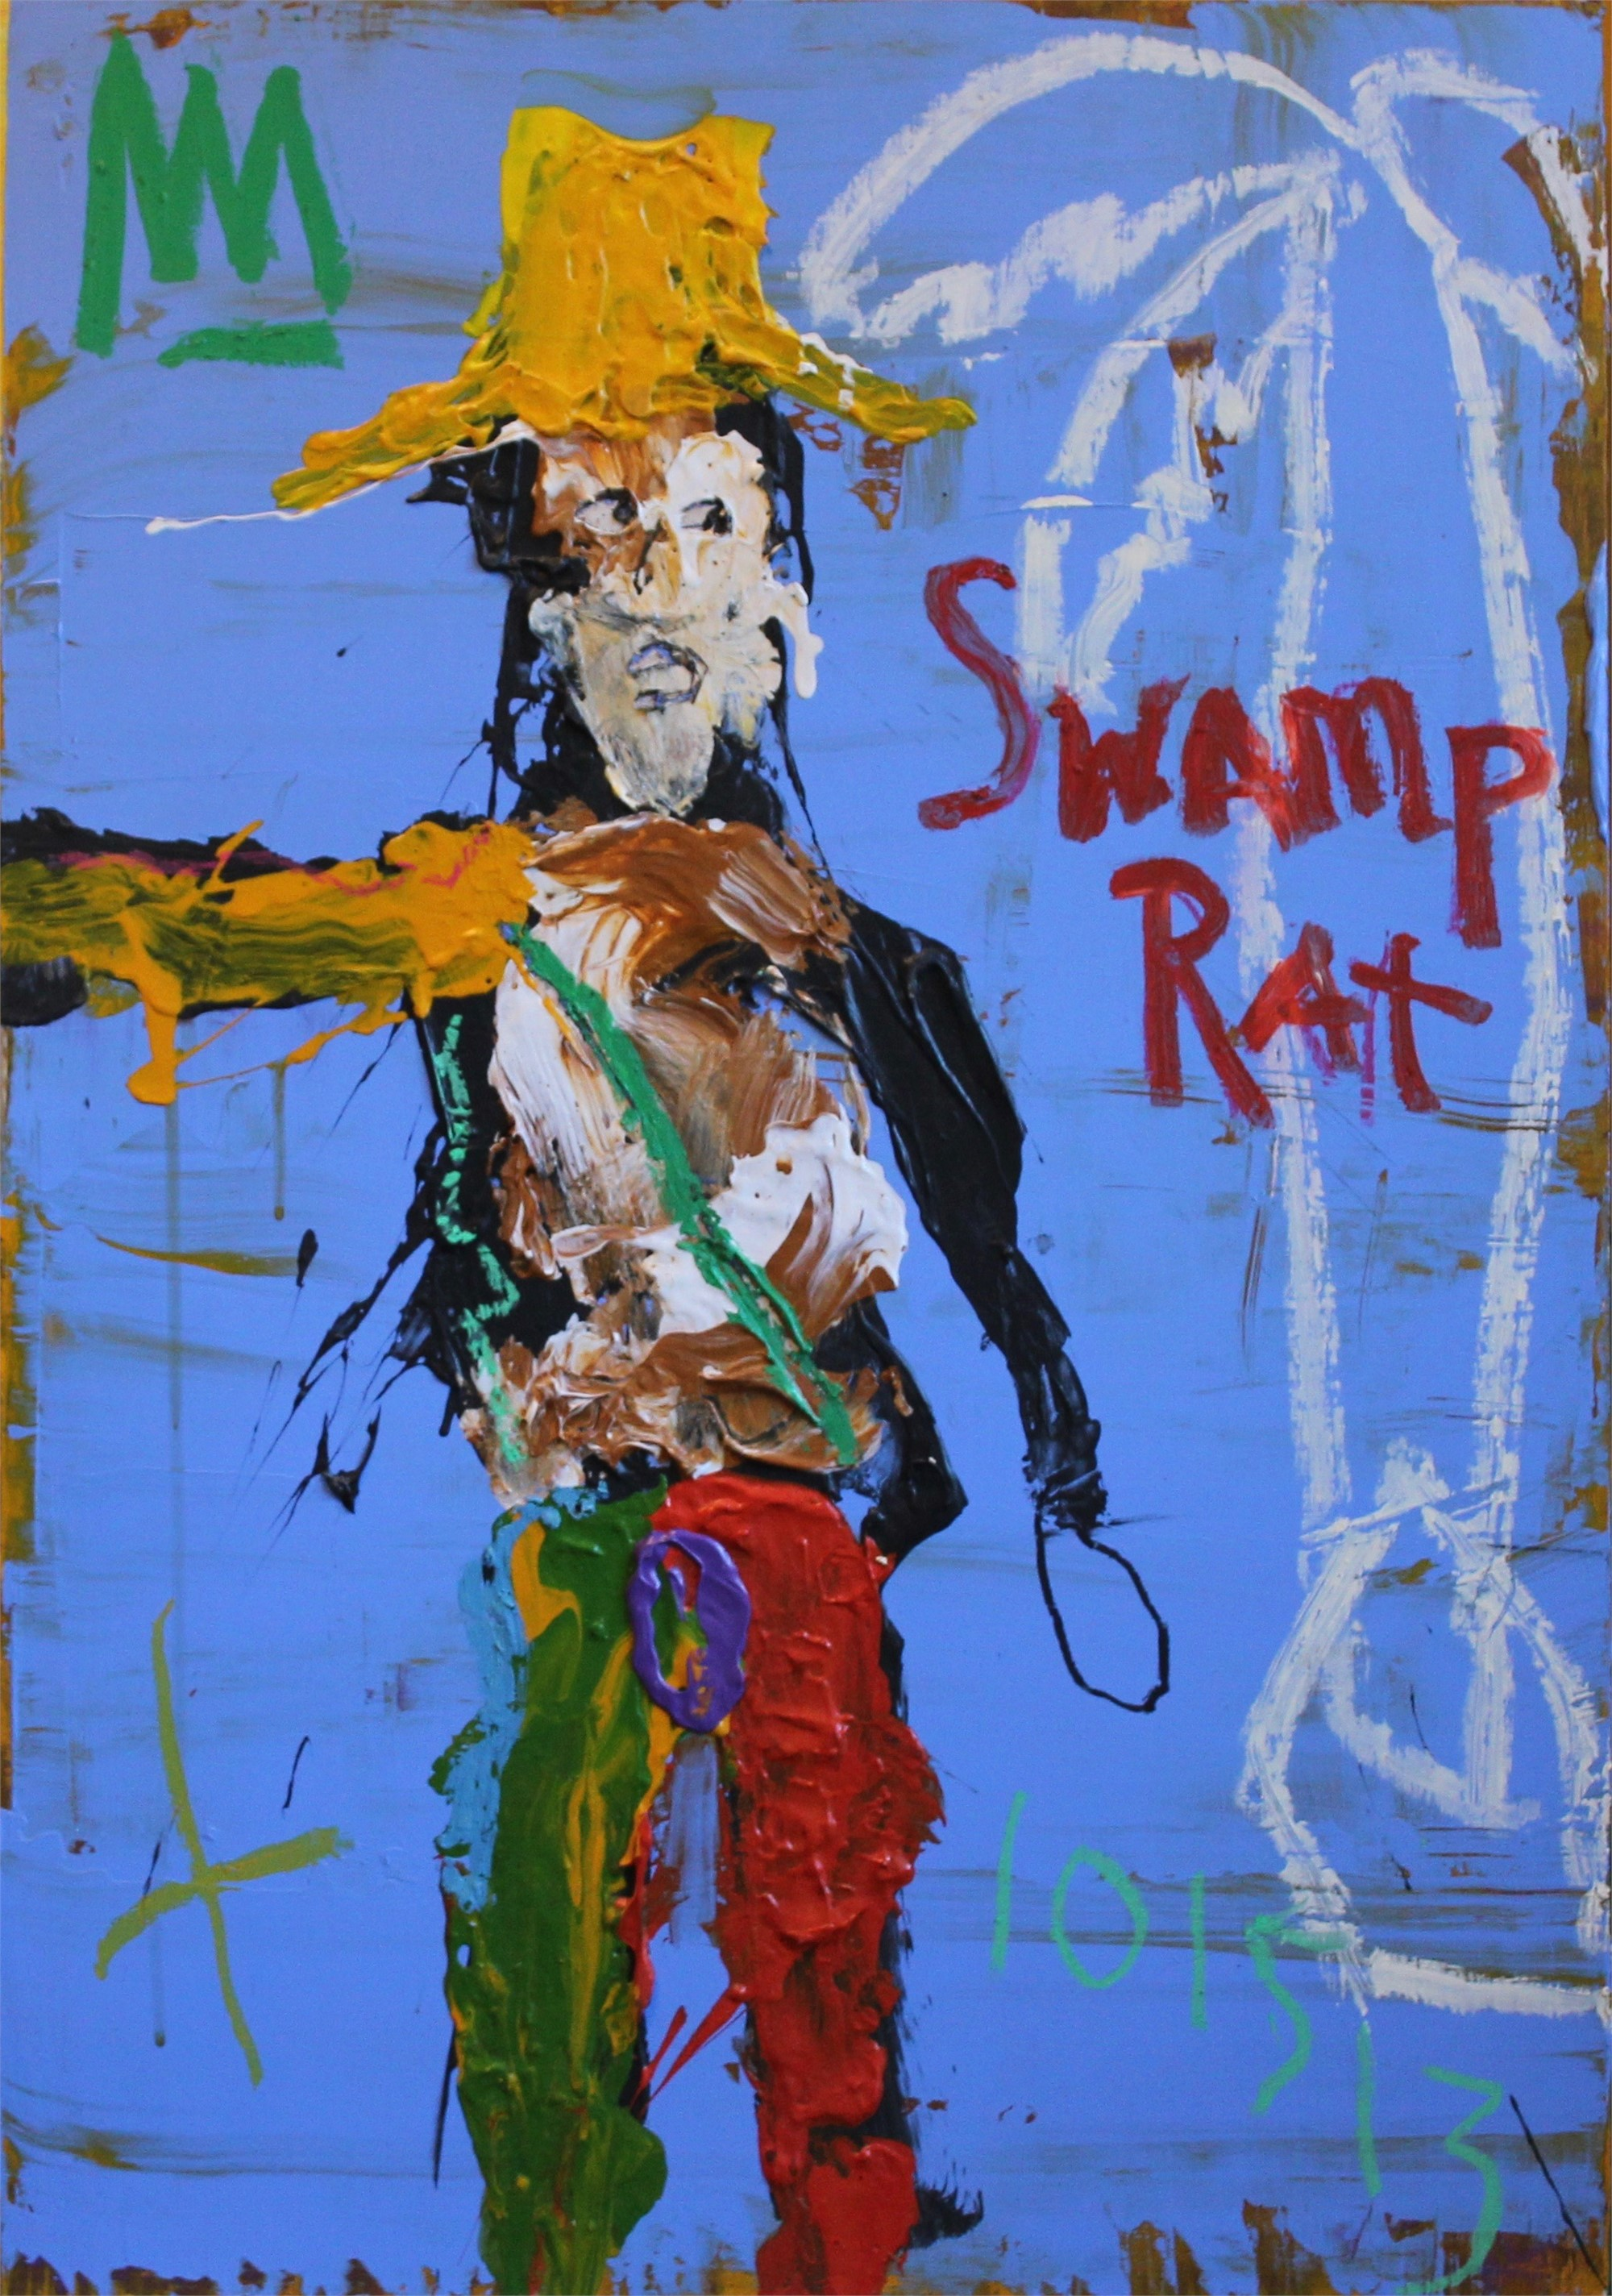 Swamp Rat by Michael Snodgrass